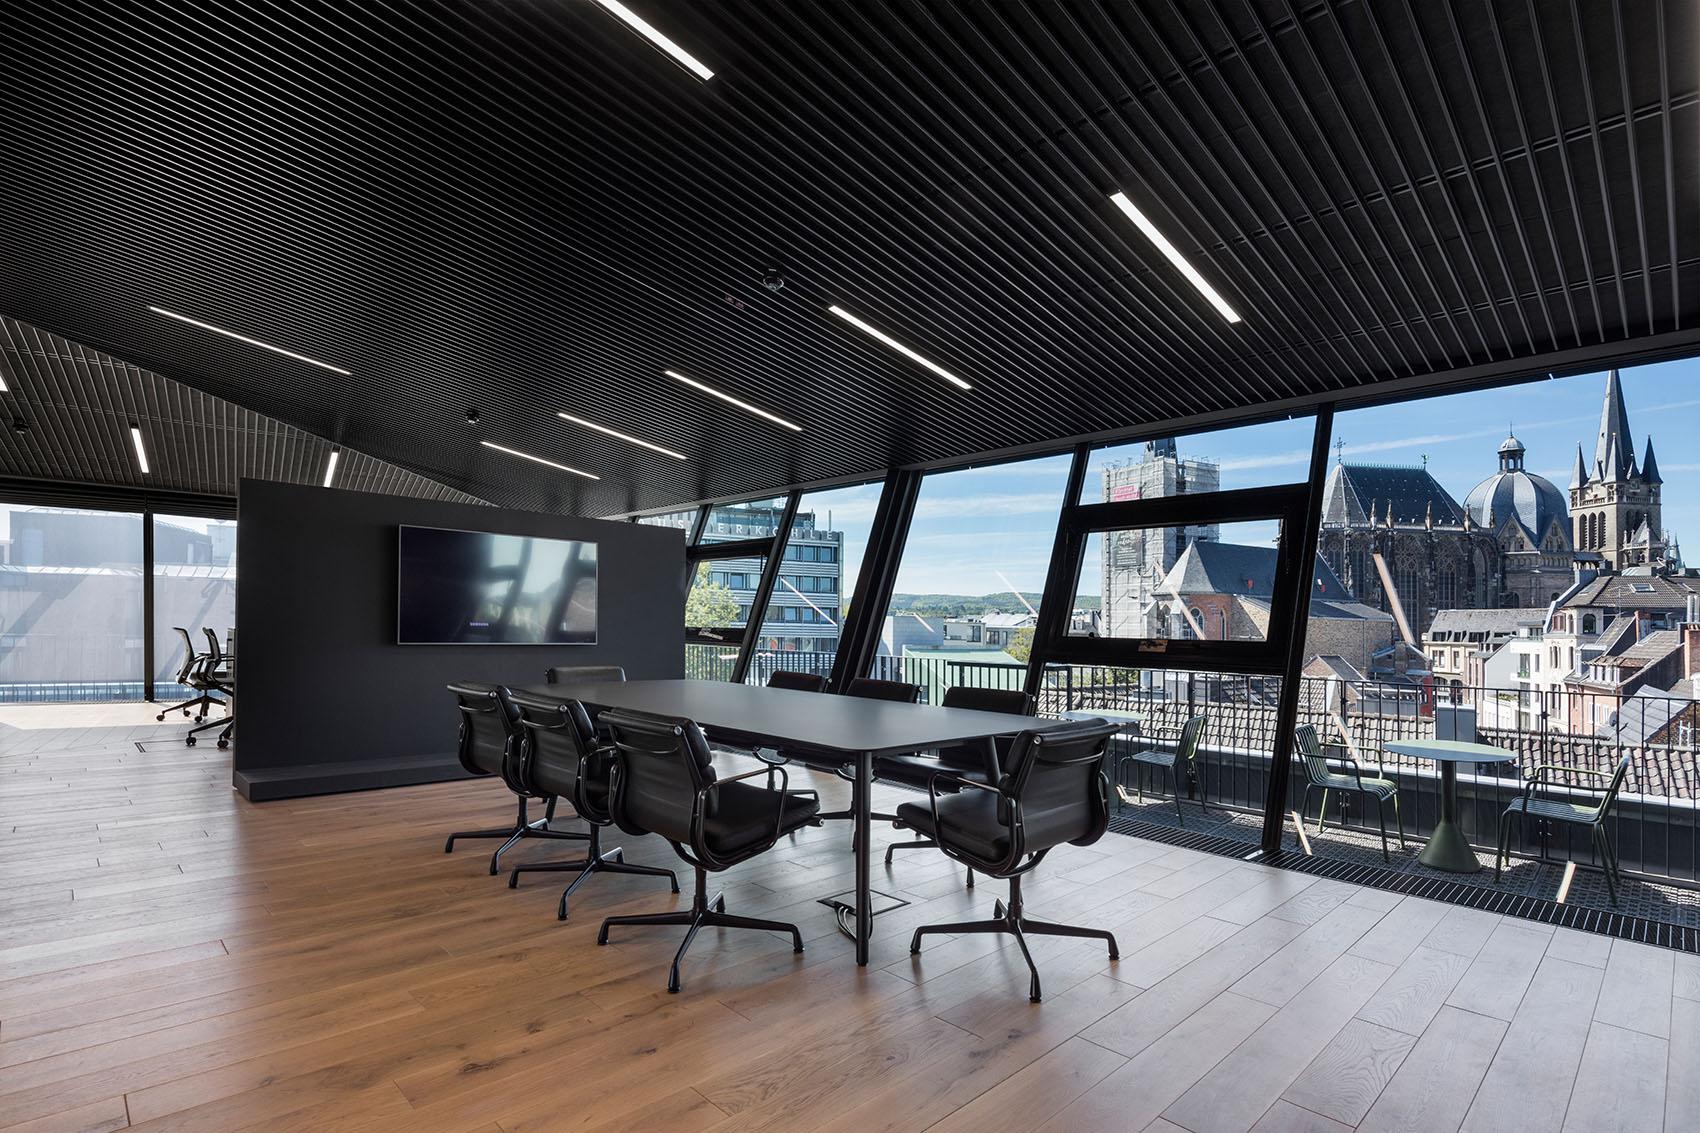 8_2_Rooftop-Office-Aachen_CROSS-Architecture.jpg